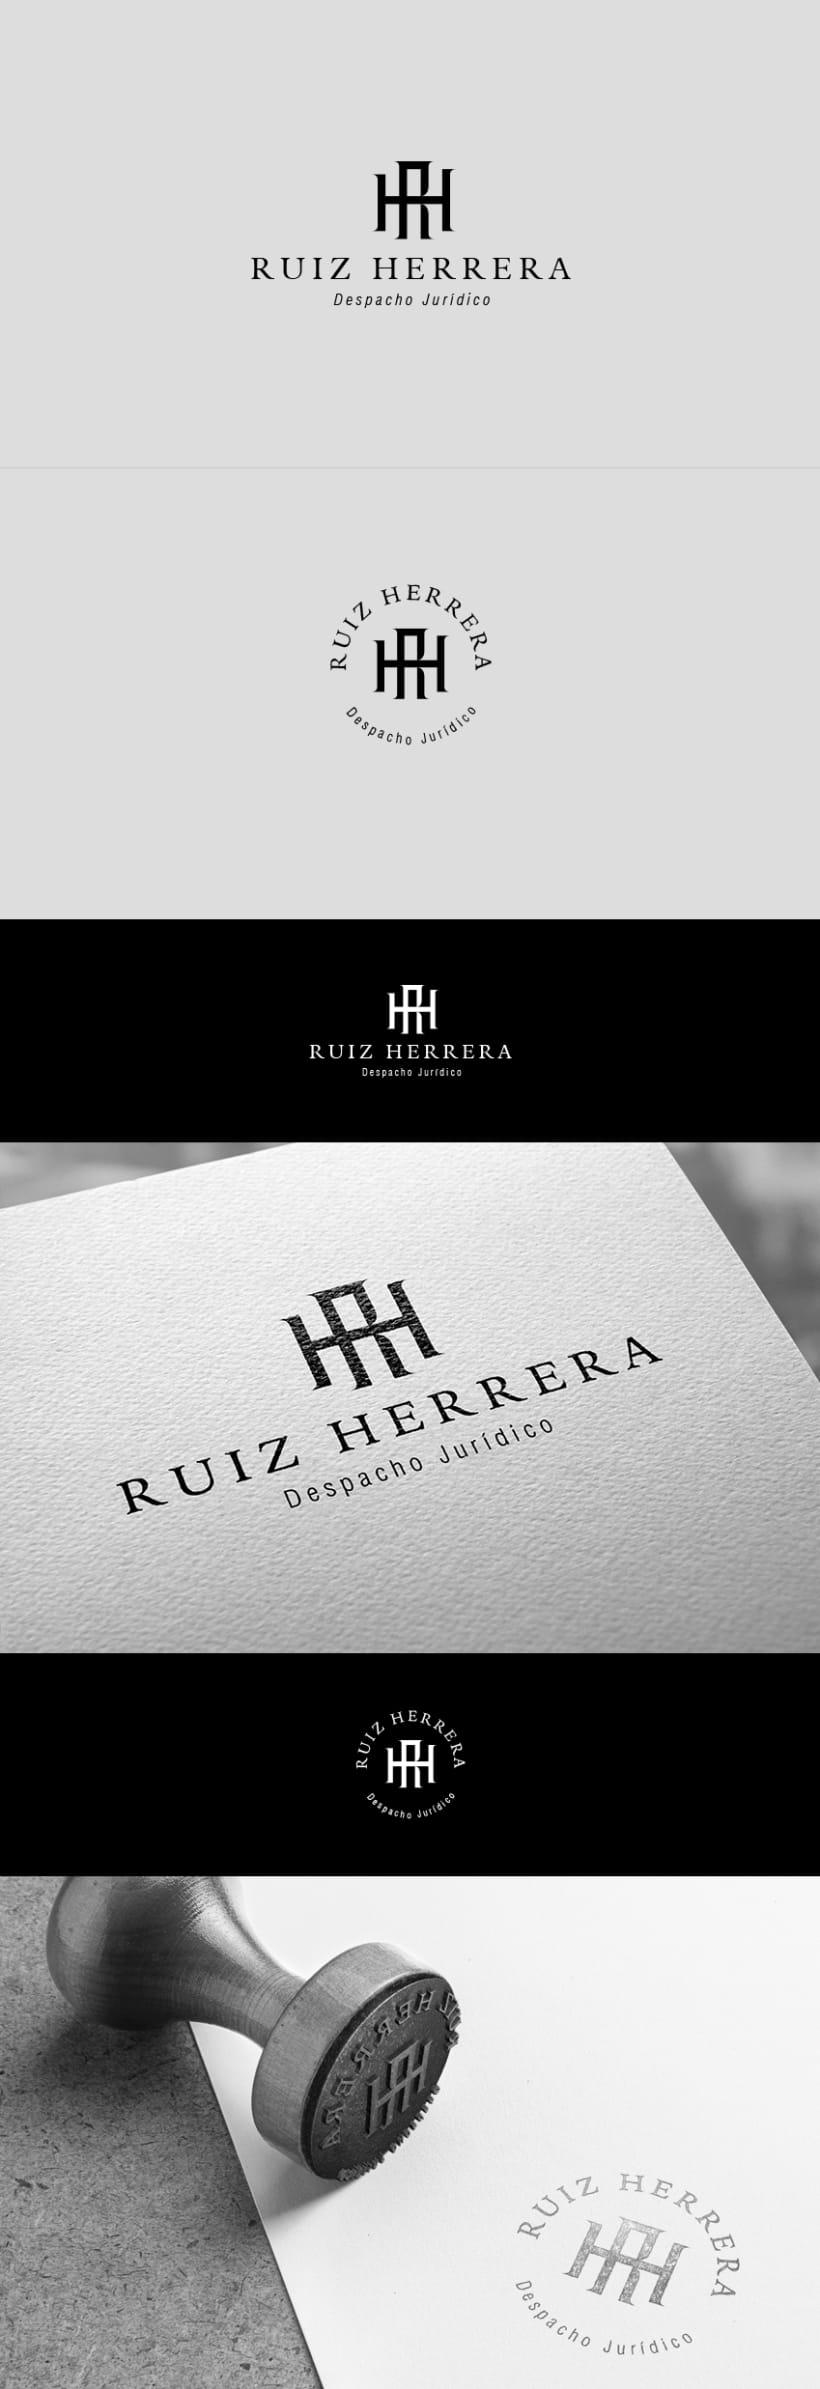 Logo Ruiz Herrera V.1 0